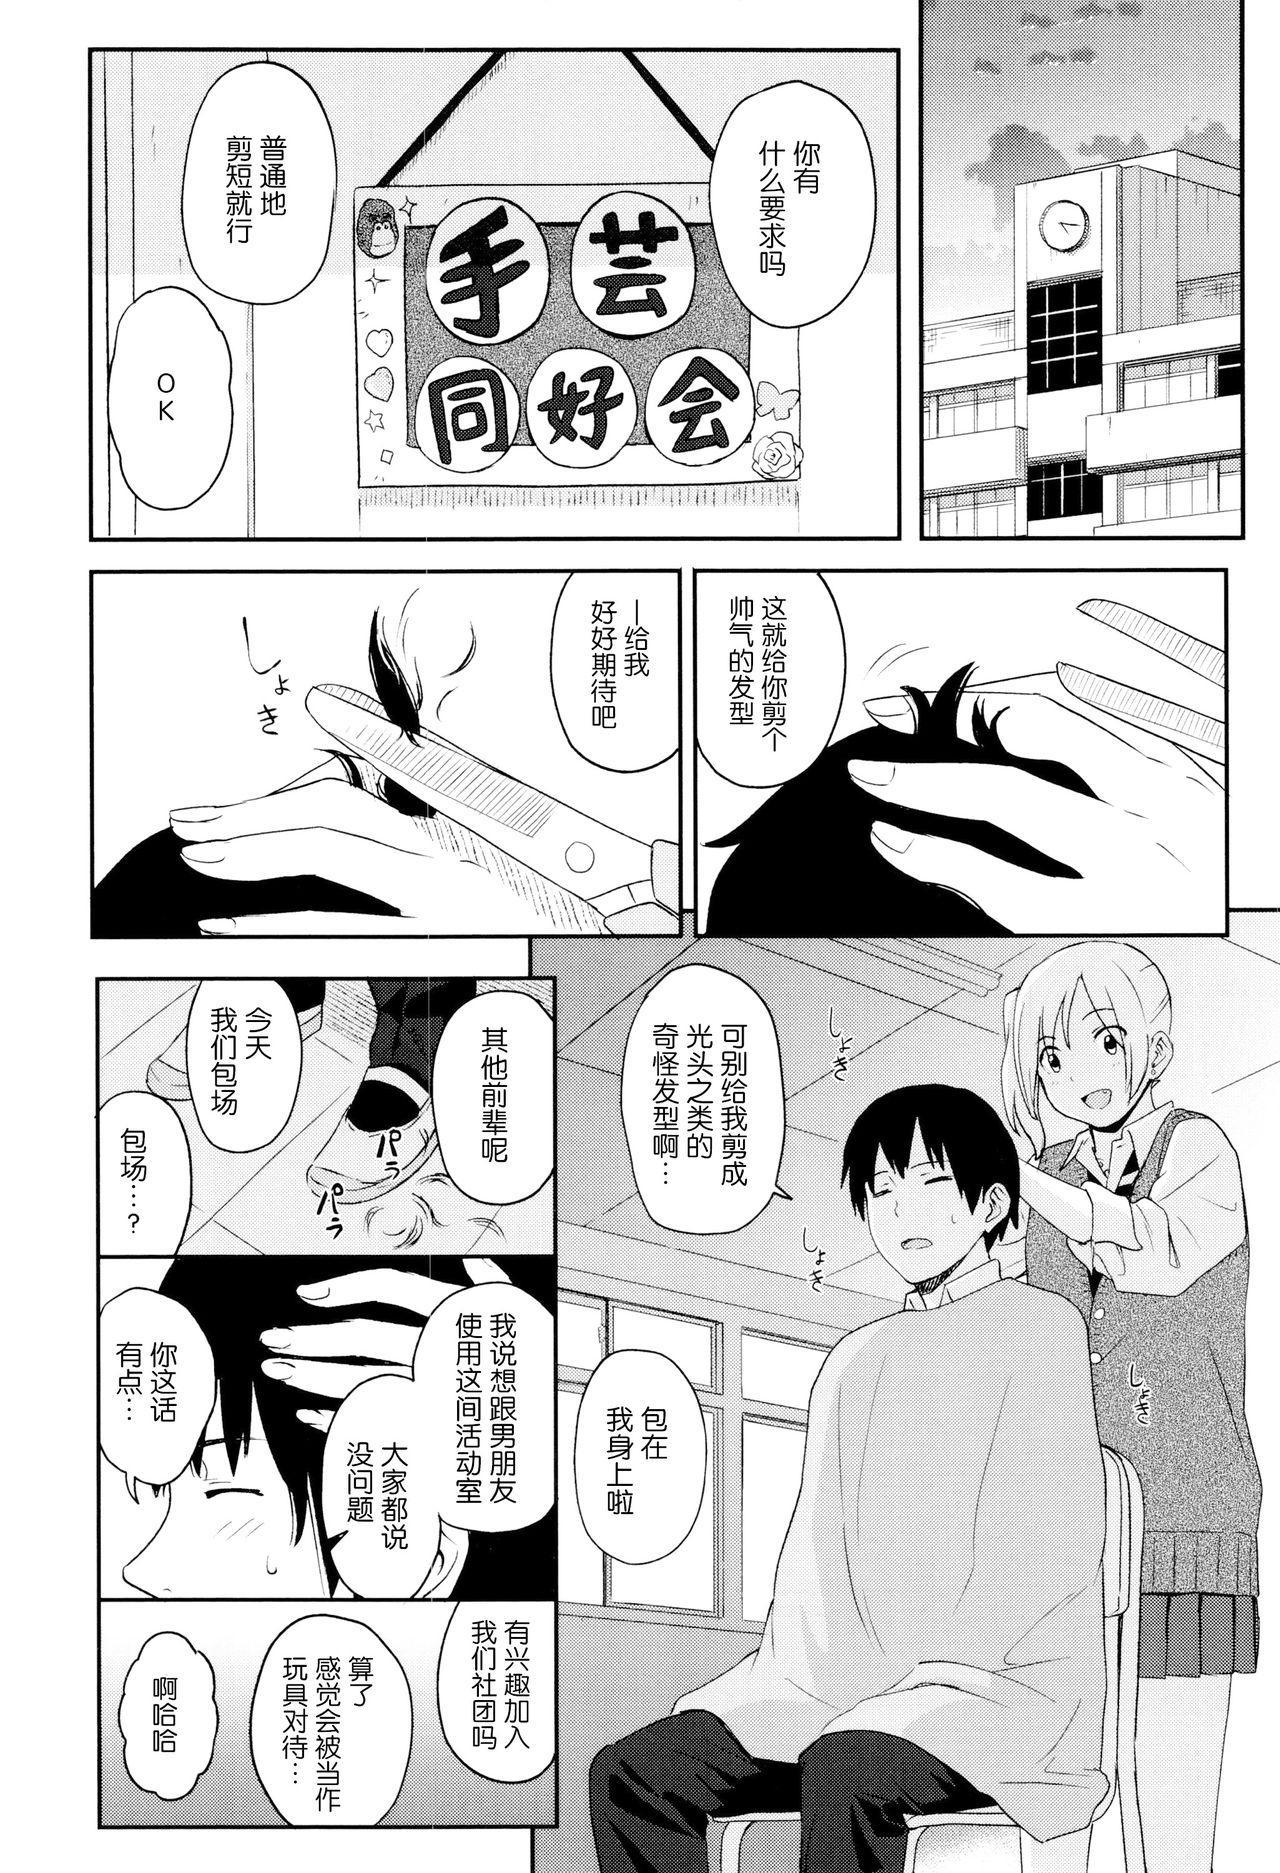 Tokubetsu na Mainichi - Special daily 50